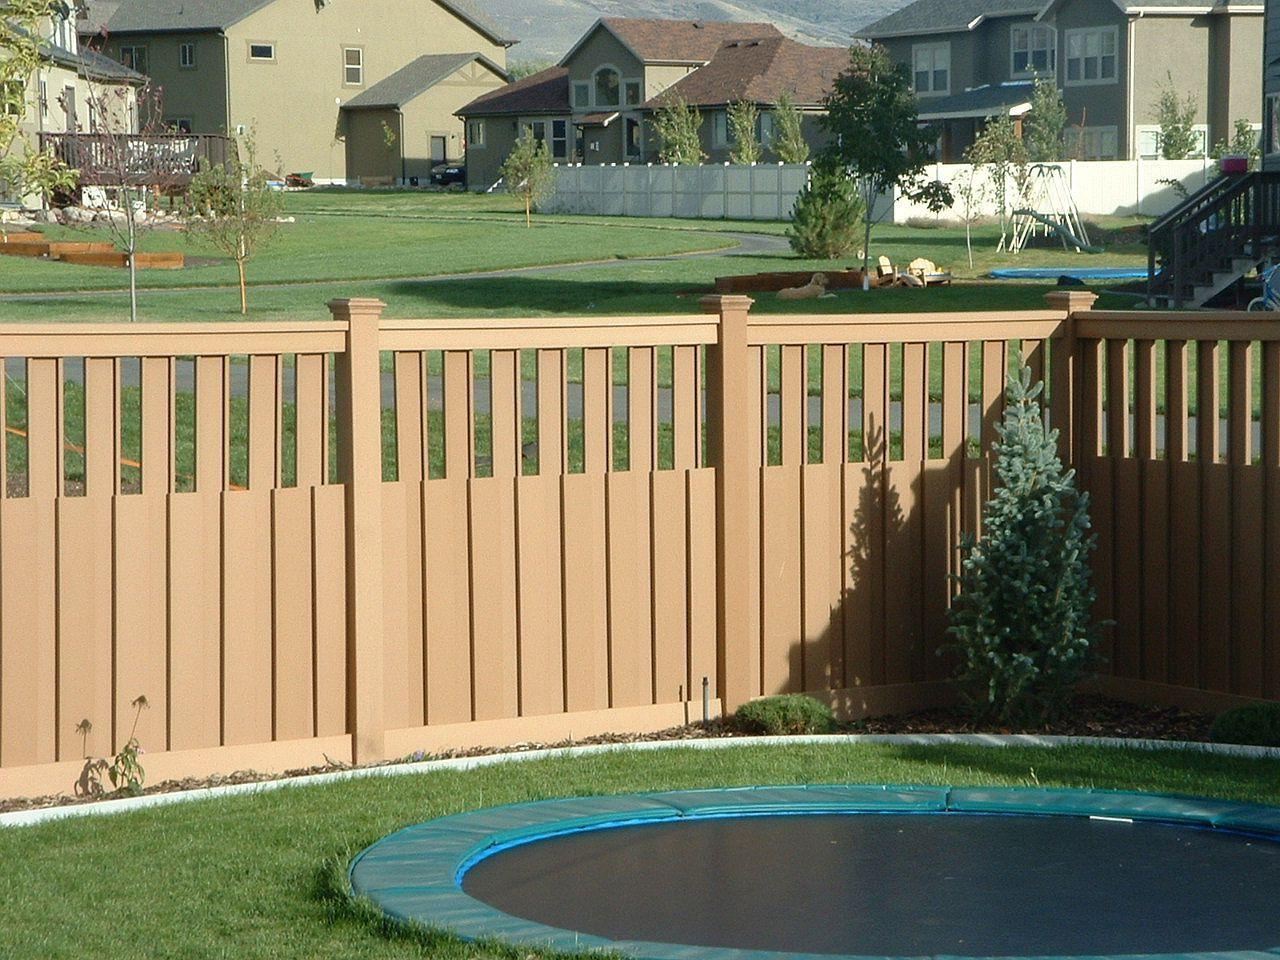 Fence decorating ideas fence designs ideas fences and exercise wooden fences baanklon Choice Image